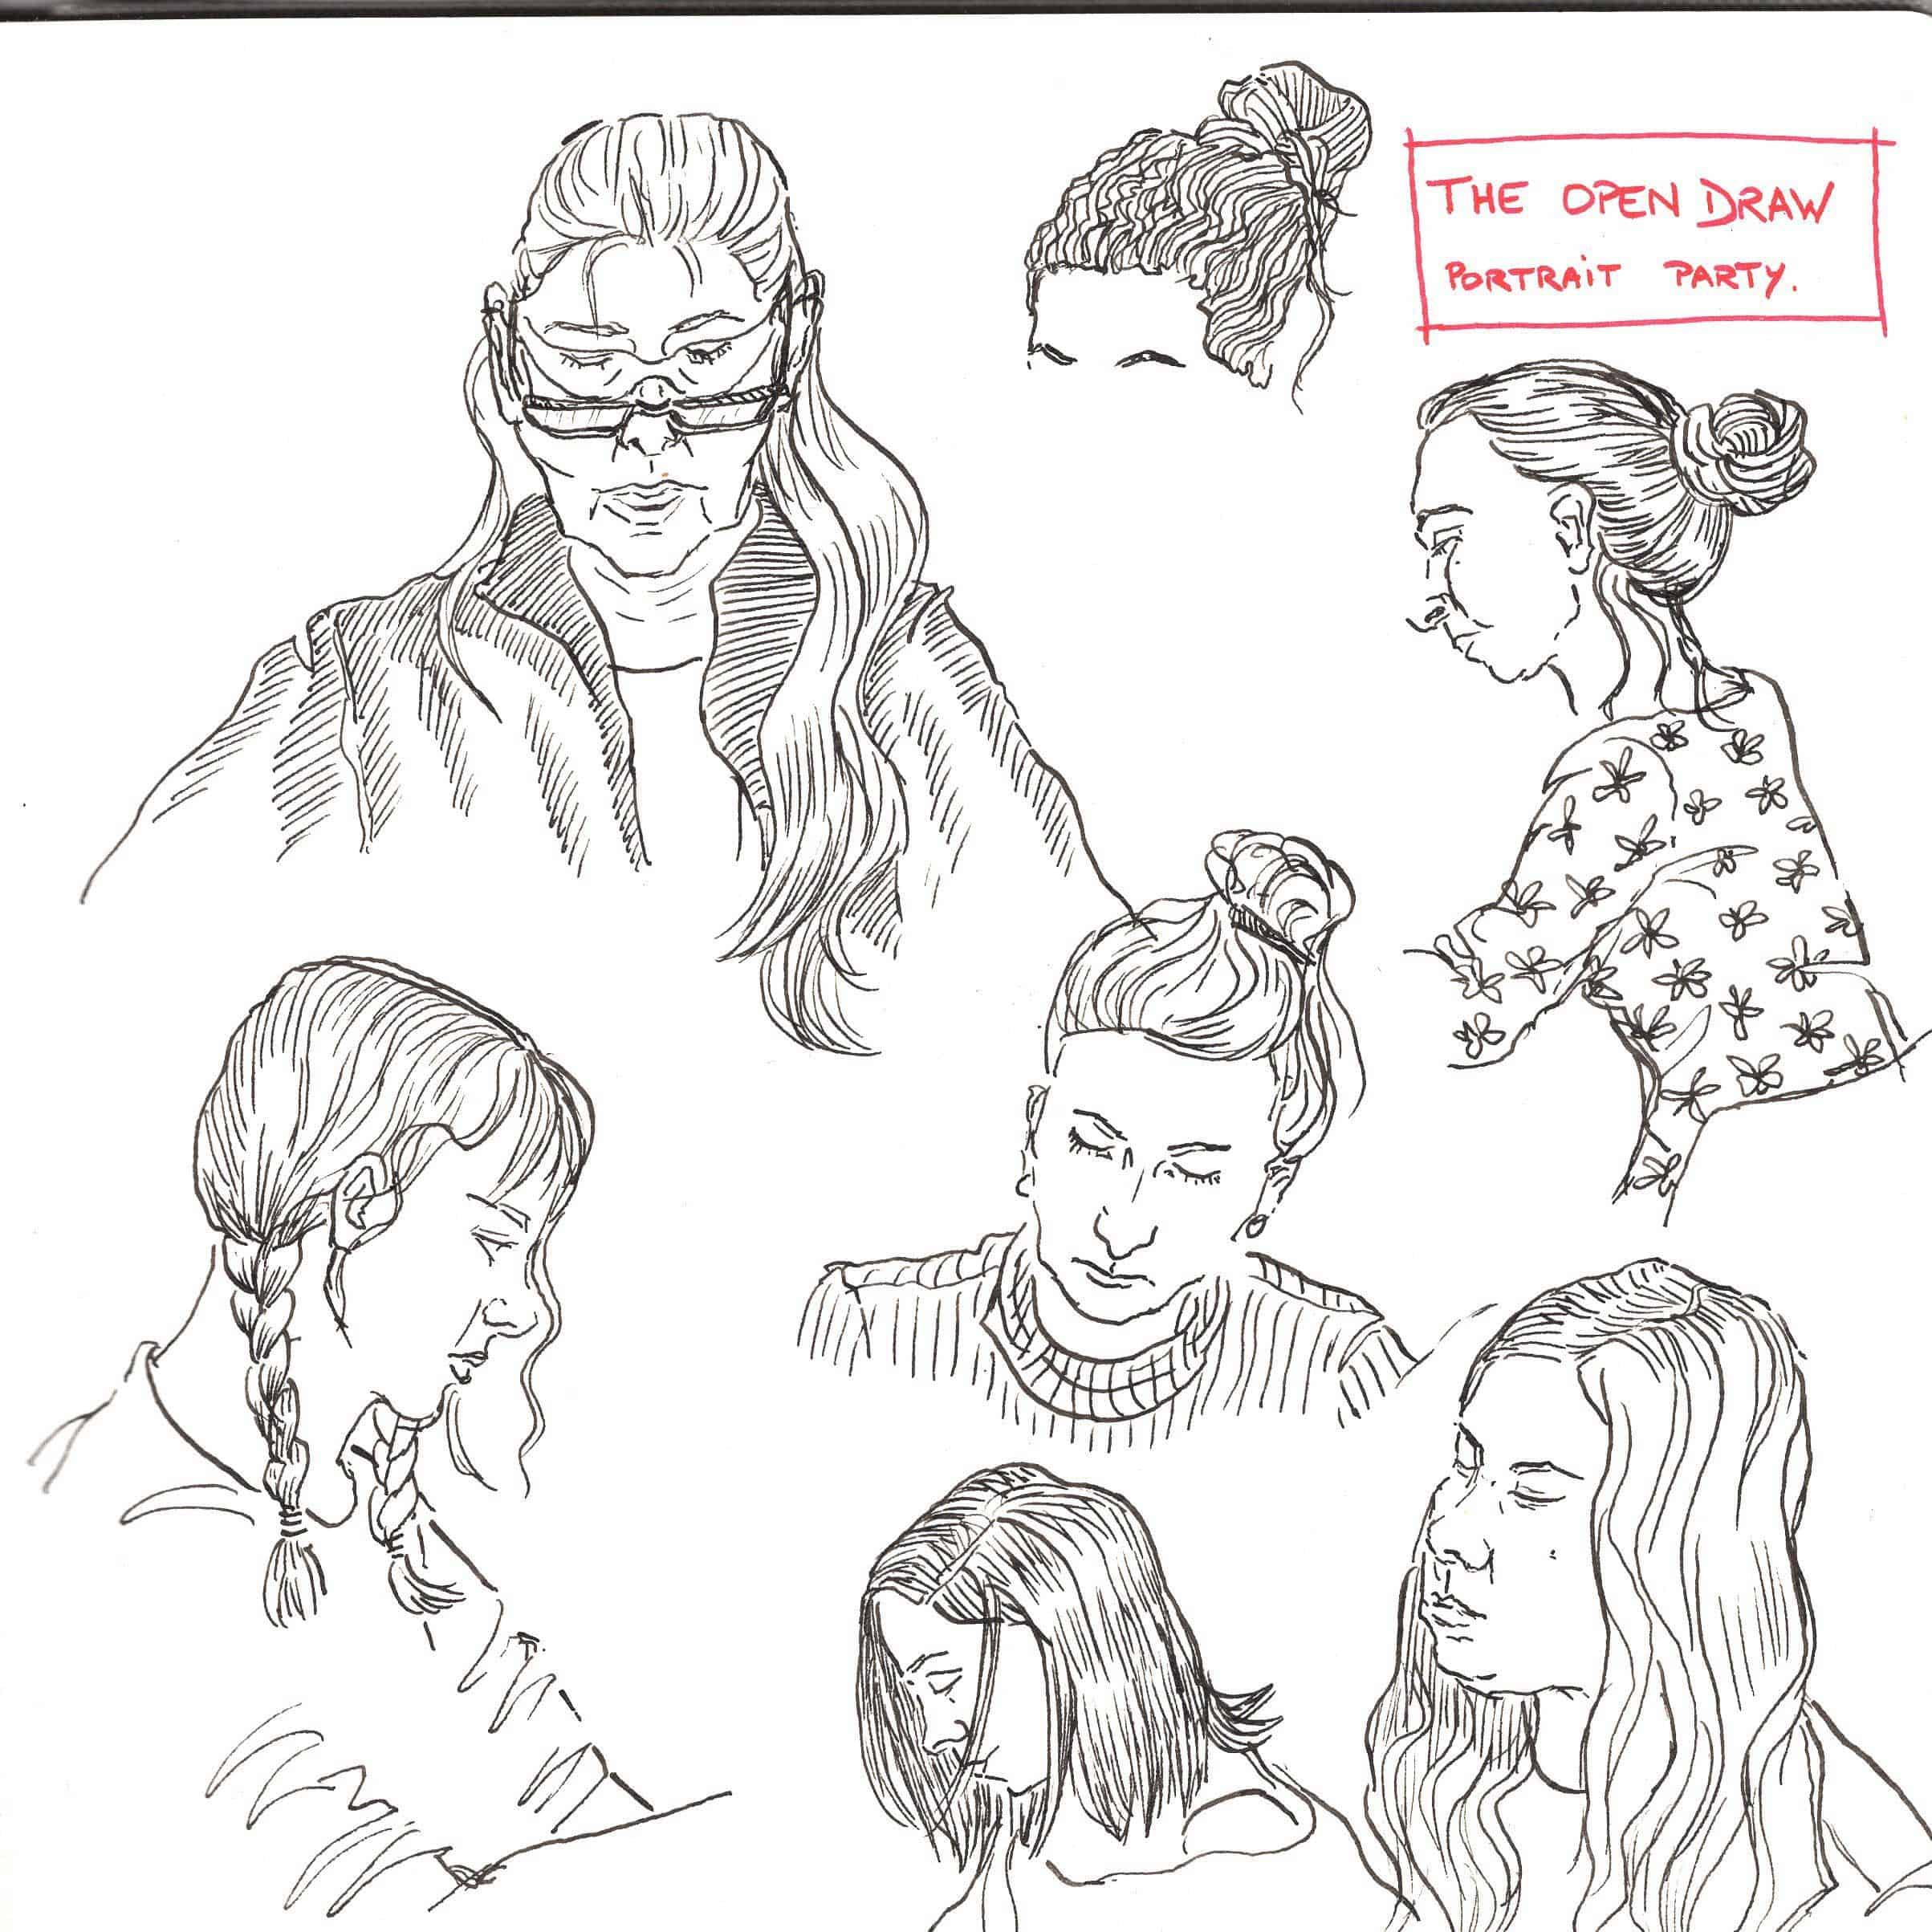 Gwen Glotin sketch technique